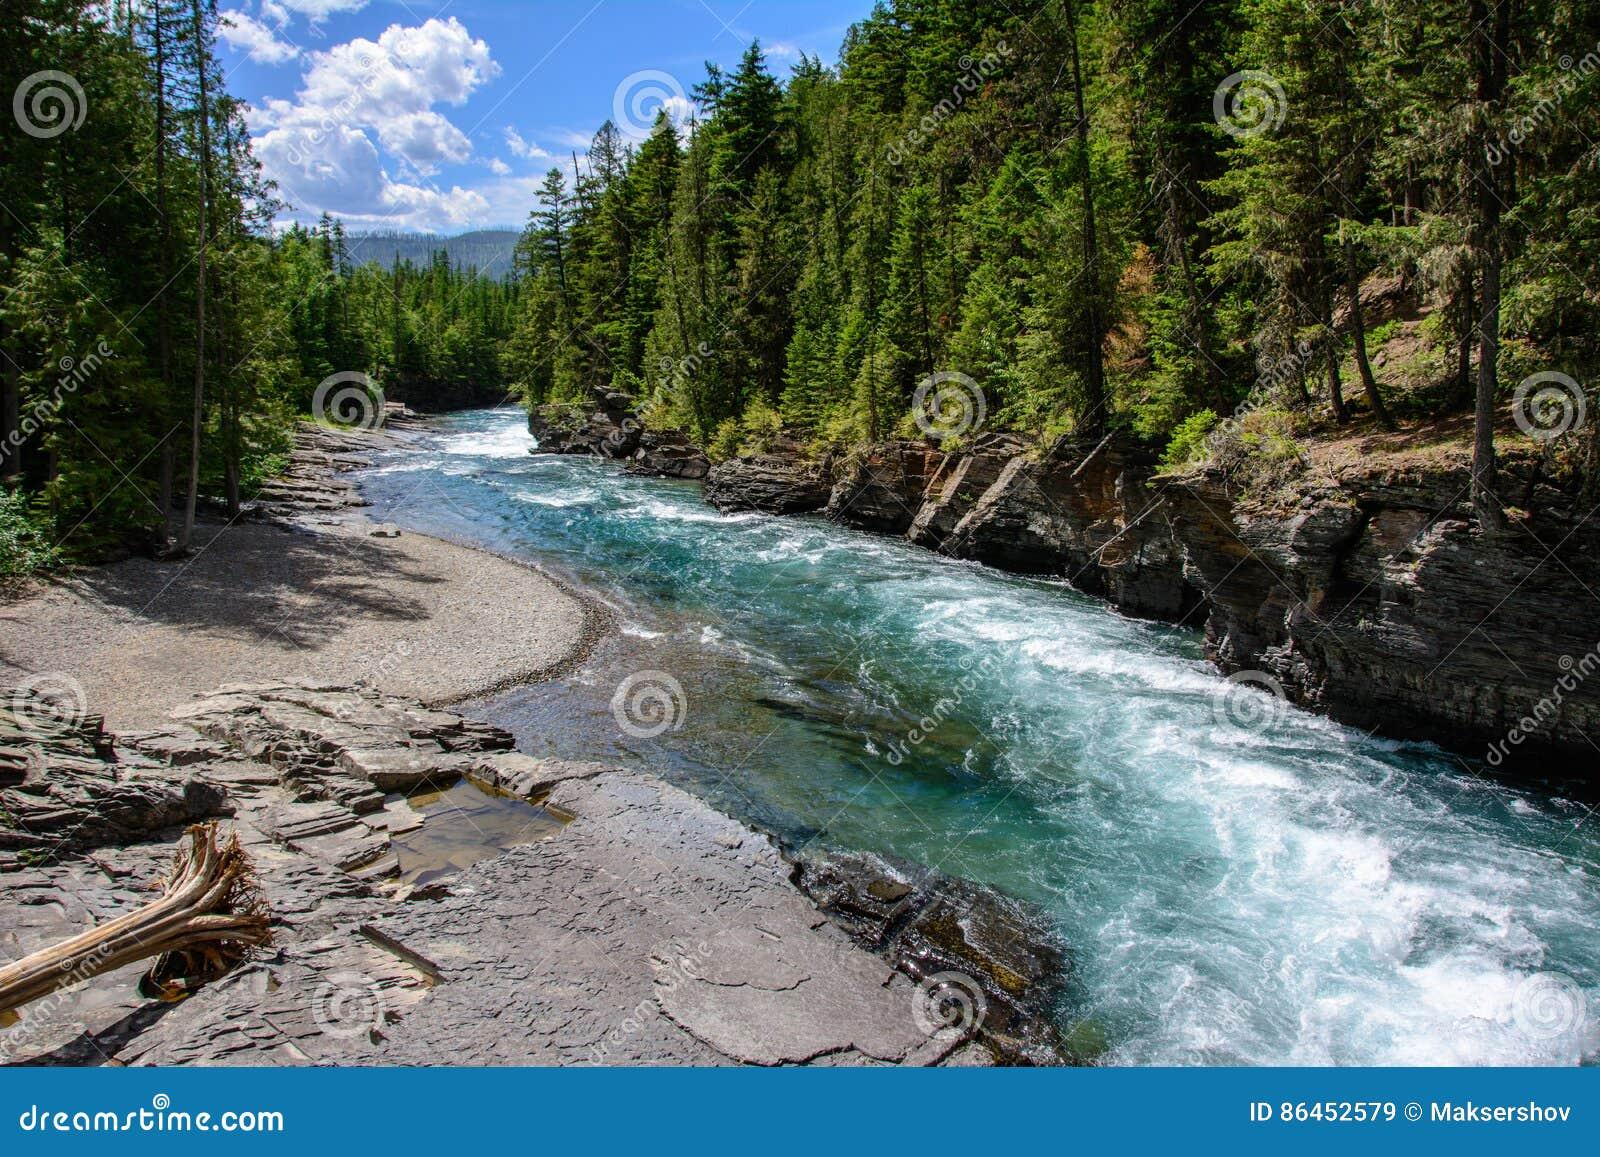 Middle Fork Flathead River In Glacier National Park, Montana US